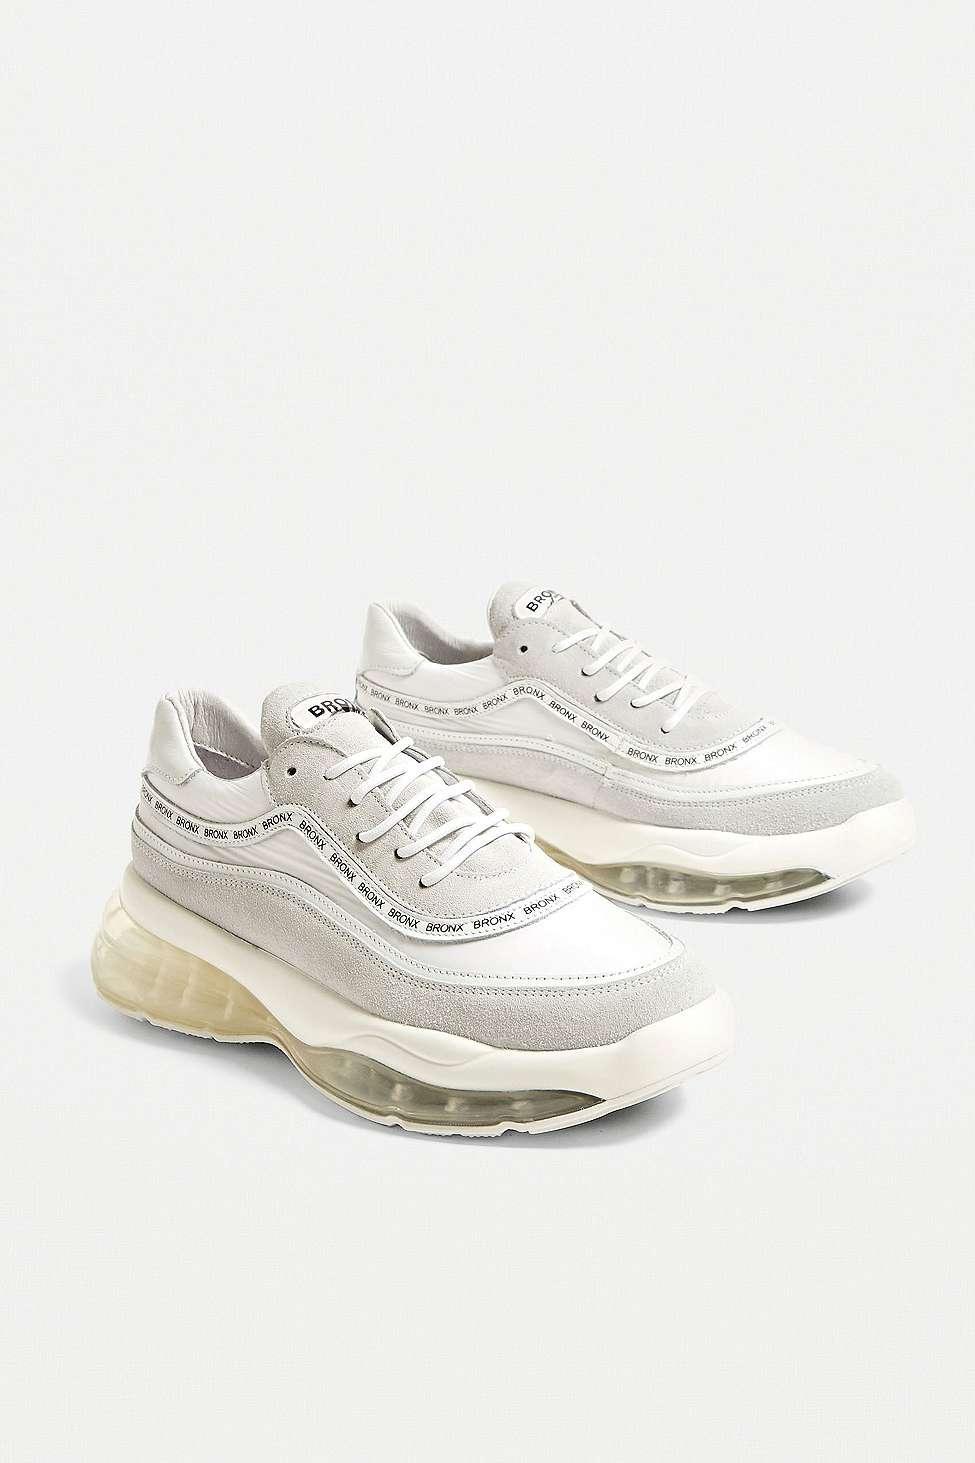 Bronx Bubbly White \u0026 Grey Suede Bubble